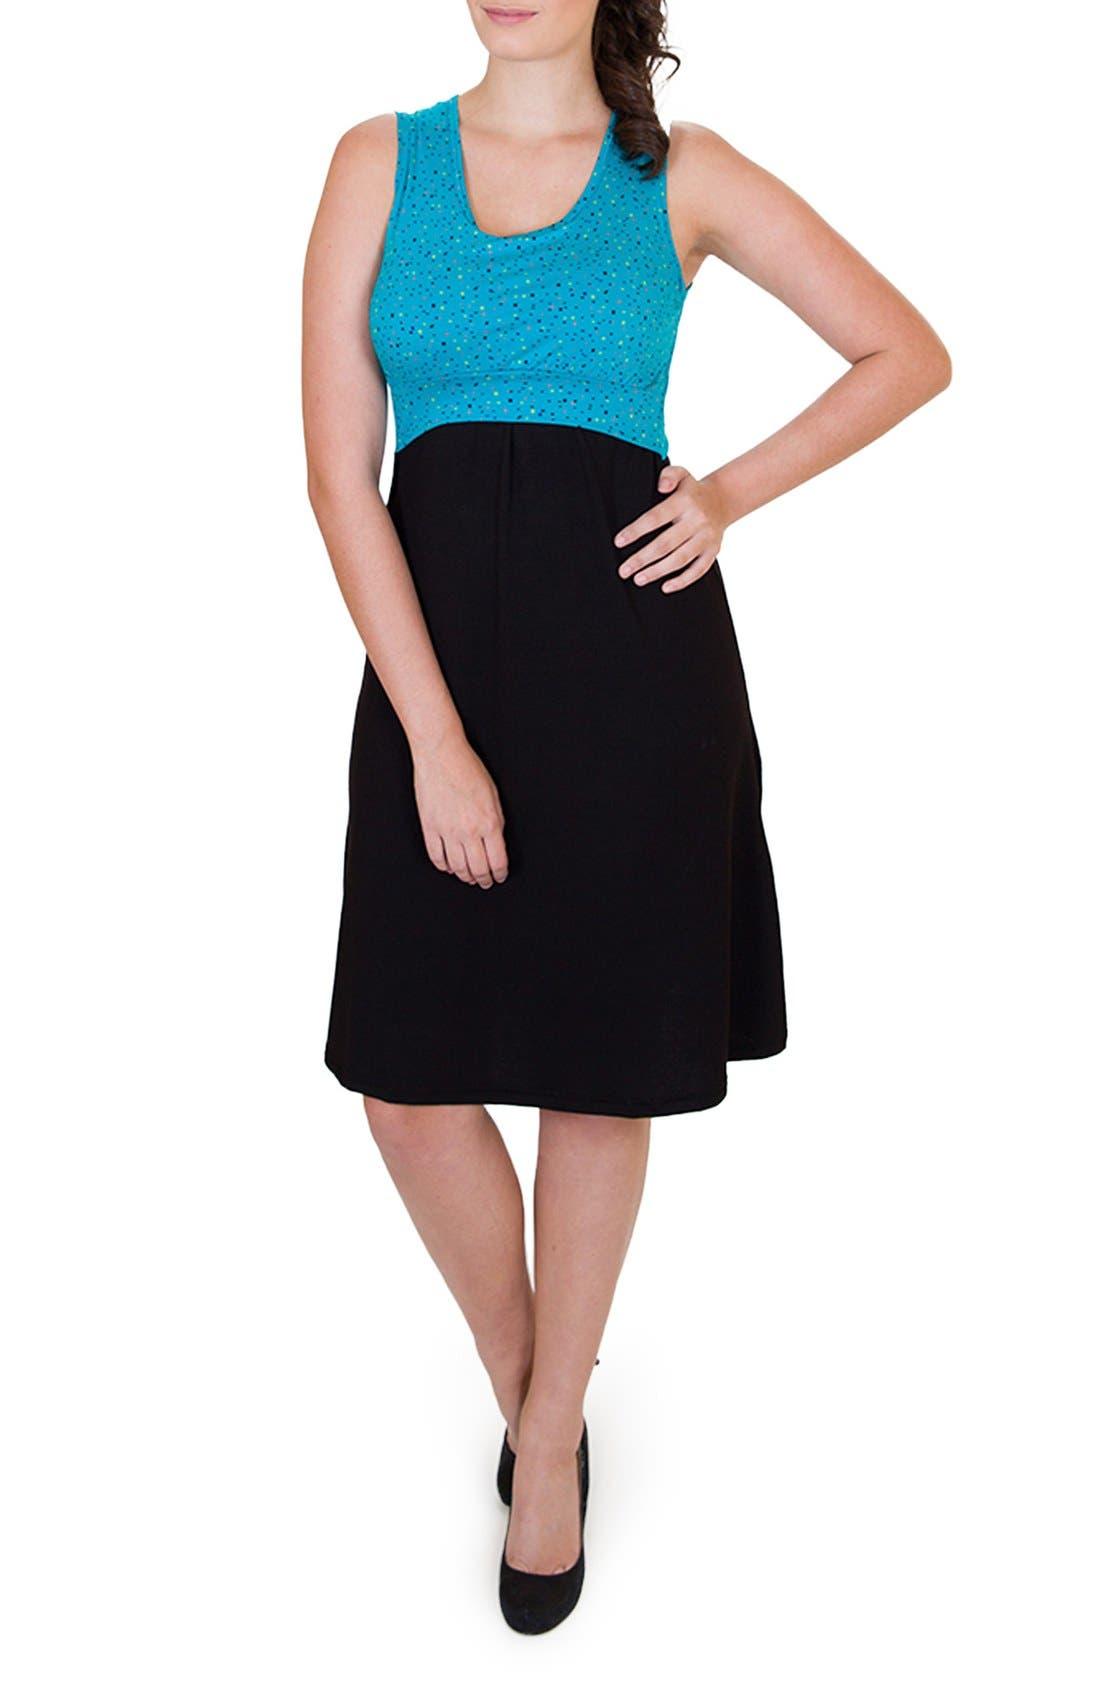 'Ana' Maternity/Nursing Dress,                         Main,                         color, DOTS TOP W/ BLACK SKIRT